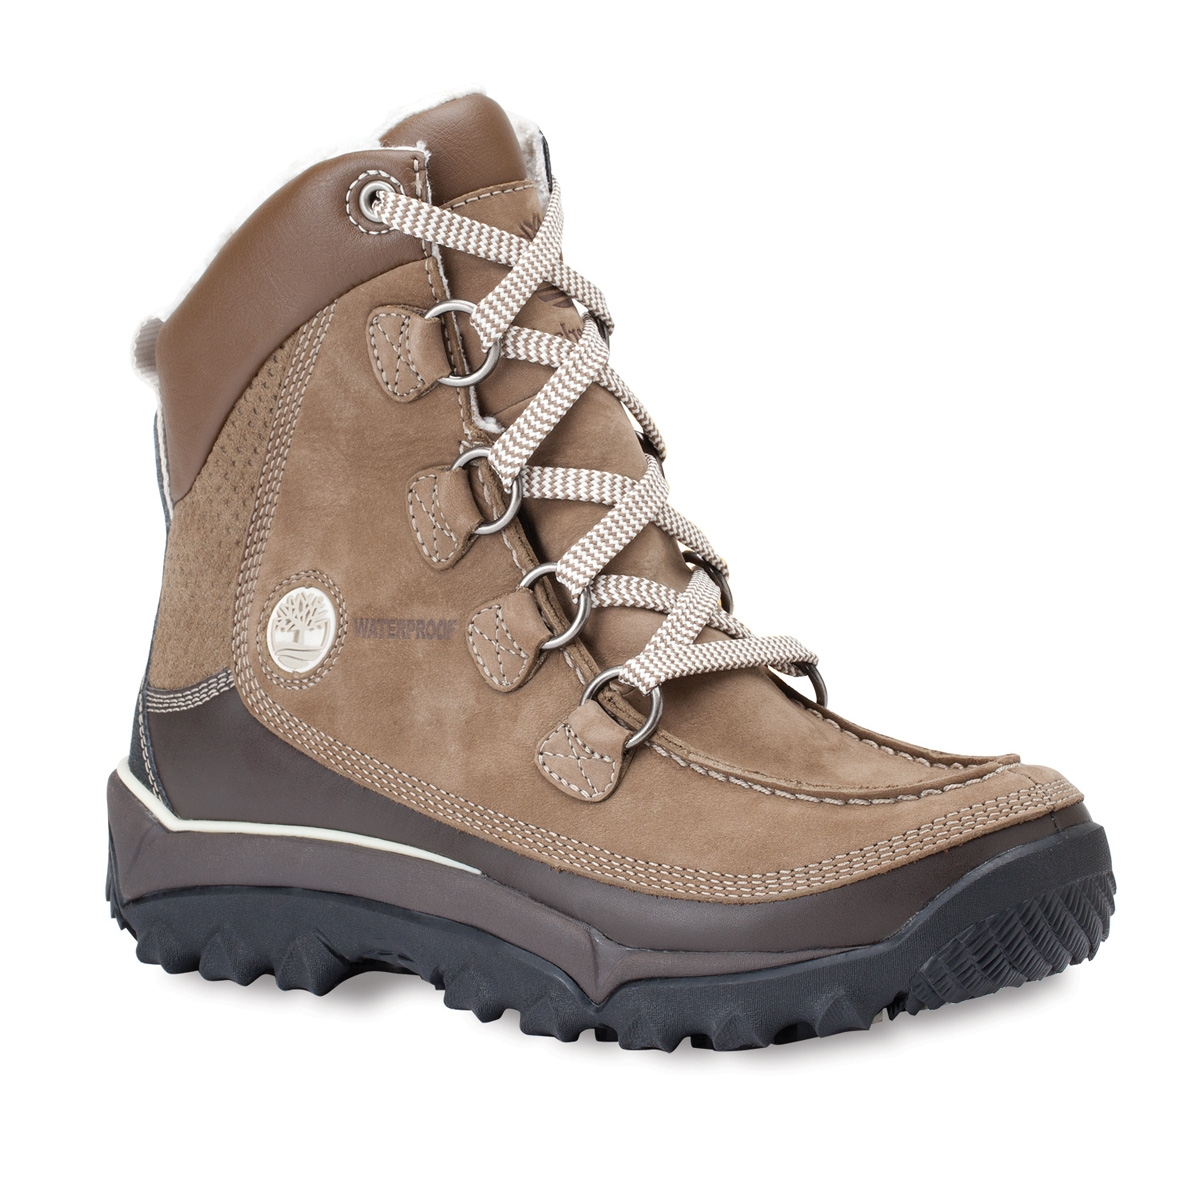 9d1521cb1b3 Timberland Rime Ridge HP WP Premium Walking Boot (Women's) - Taupe